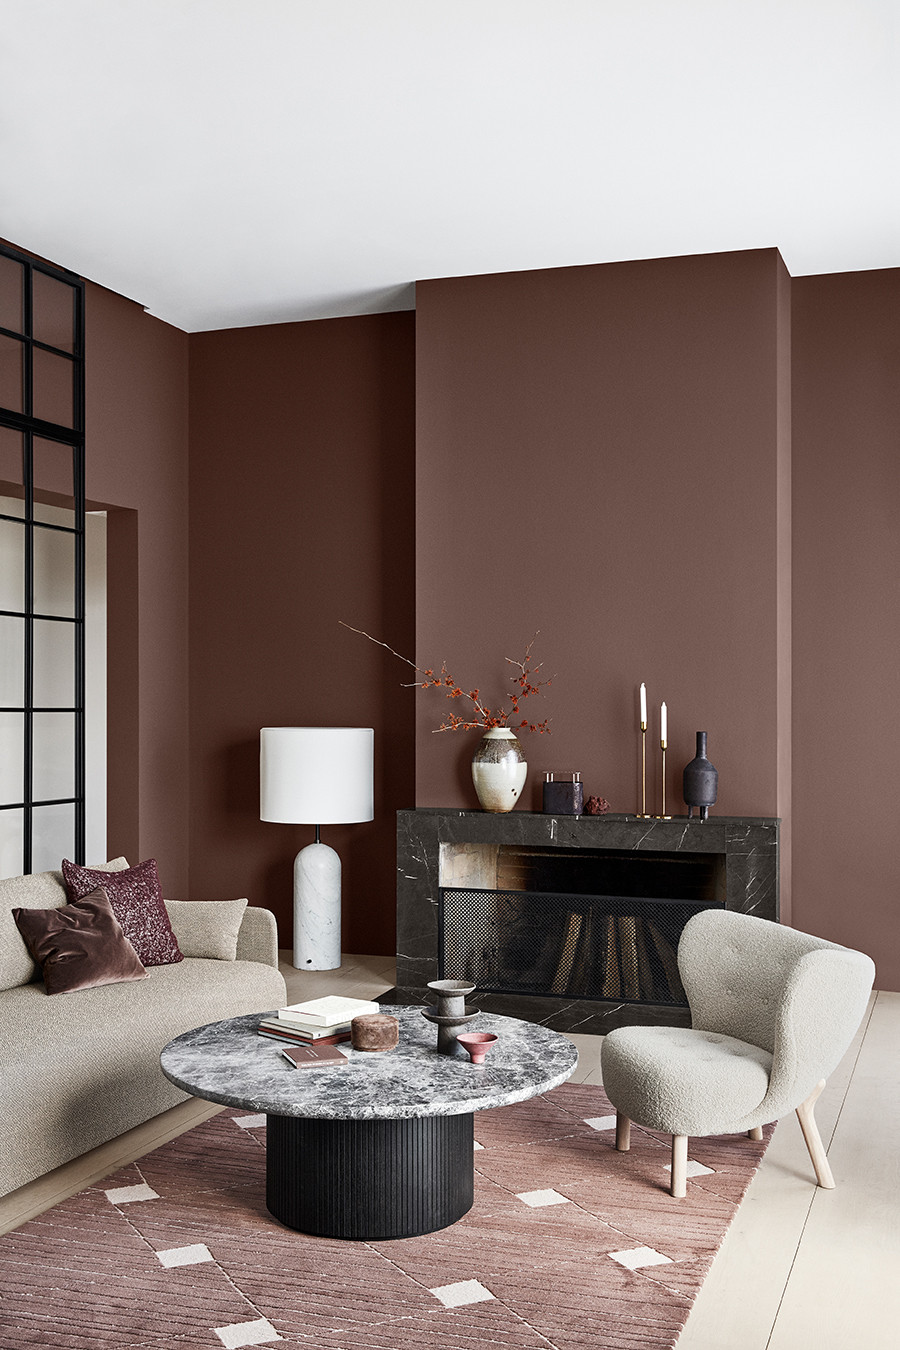 Living room decor inspiration, colour trend for 2020